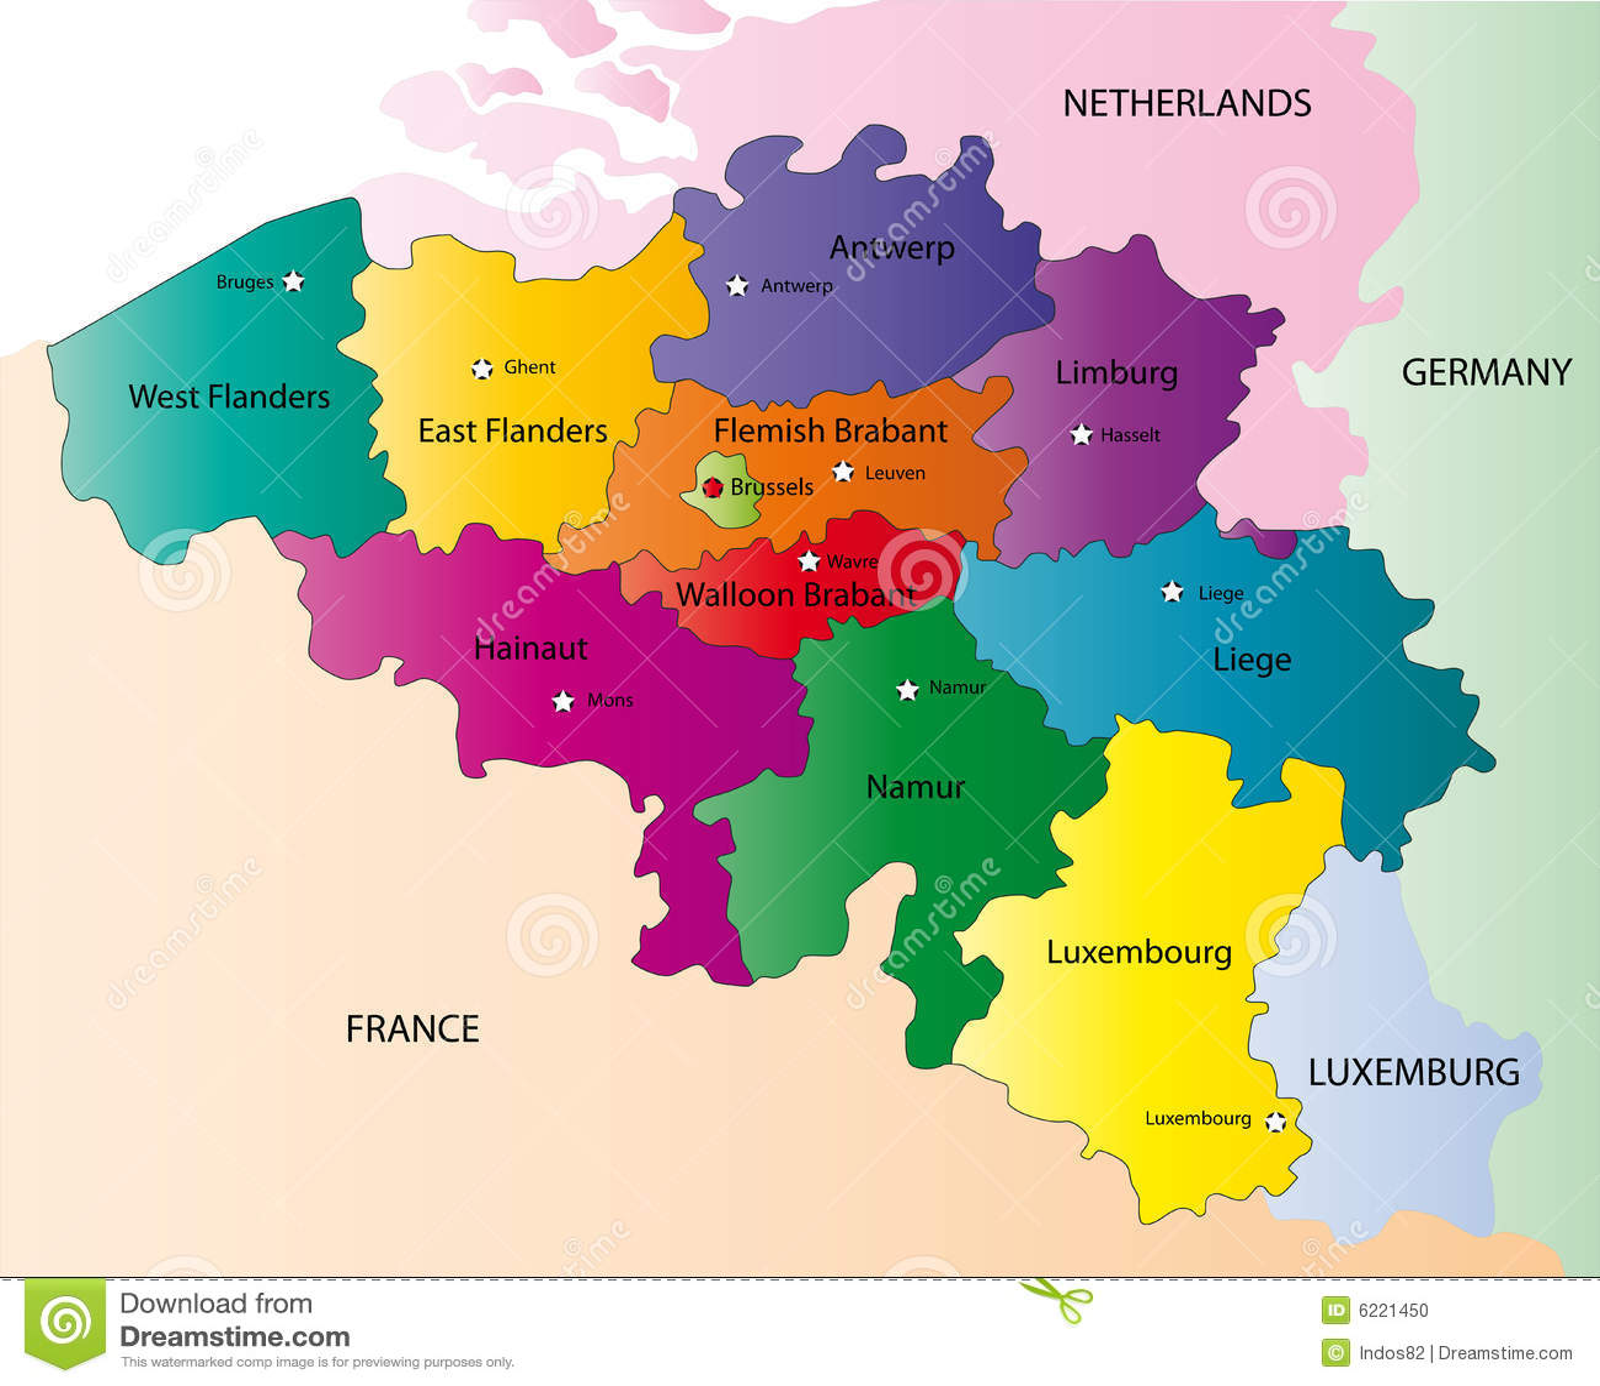 Belgium Map Photo Image 6221450 – Belgiummap